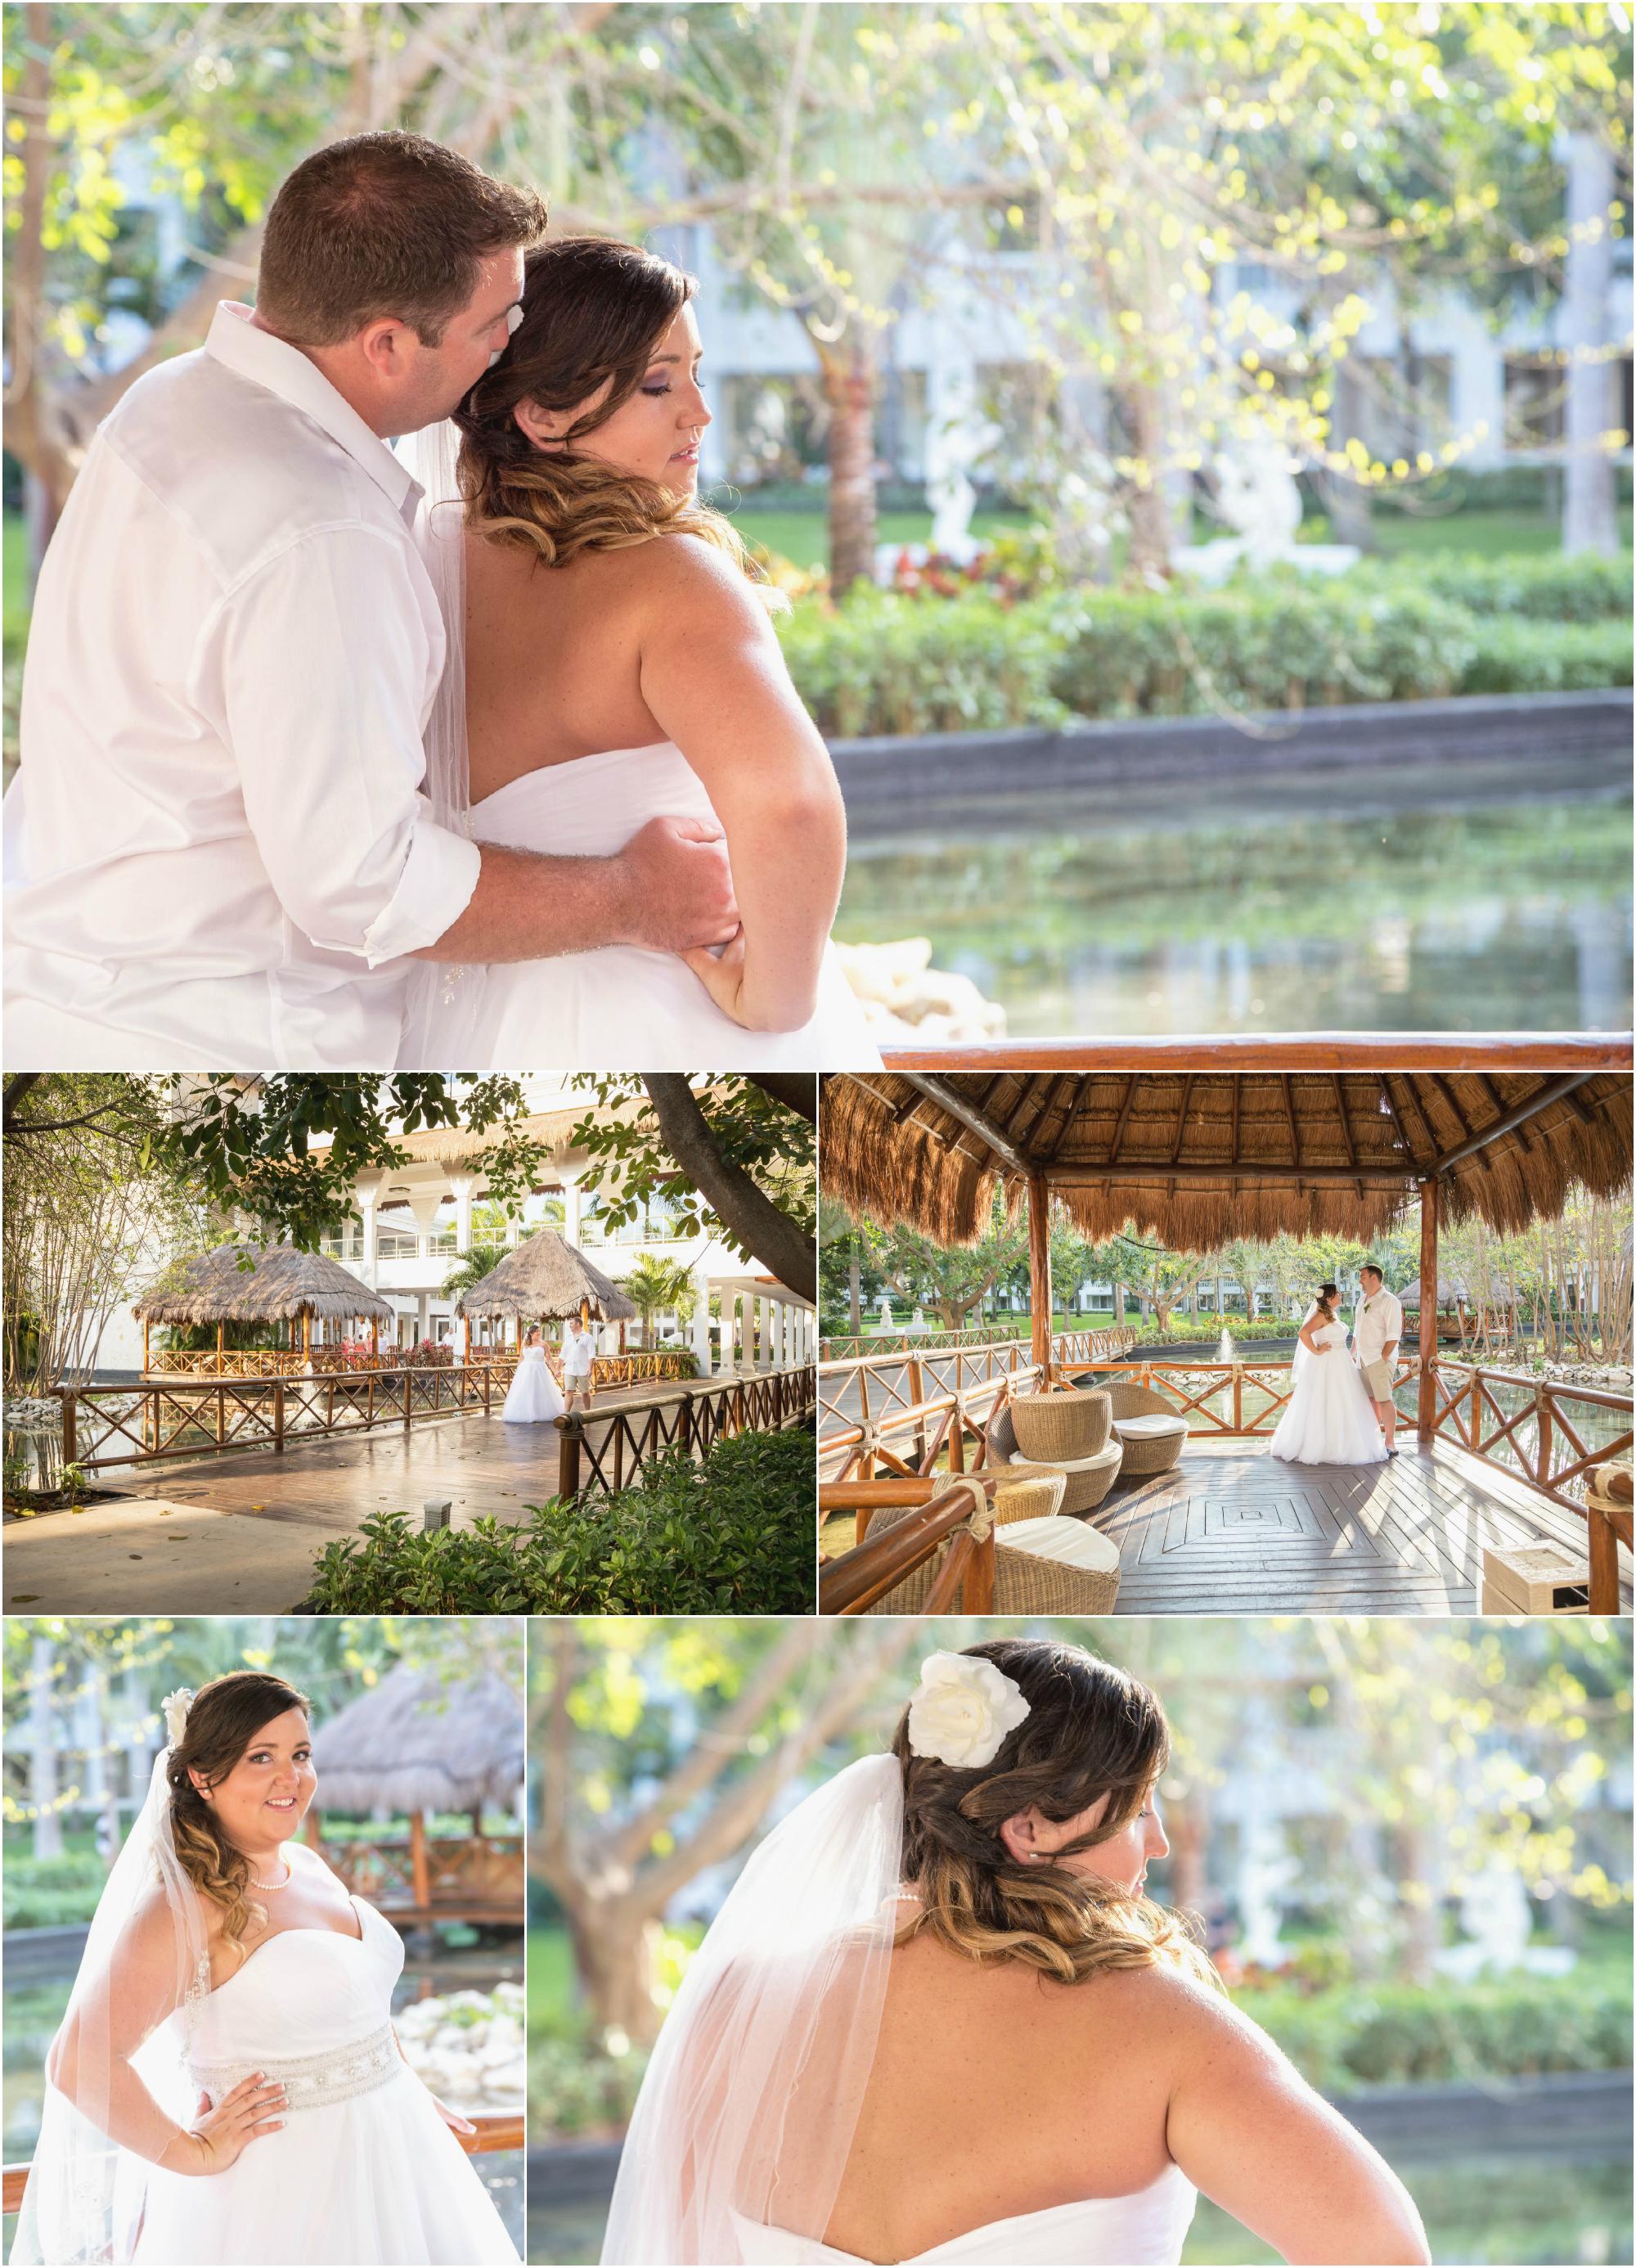 cancun_wedding26.png